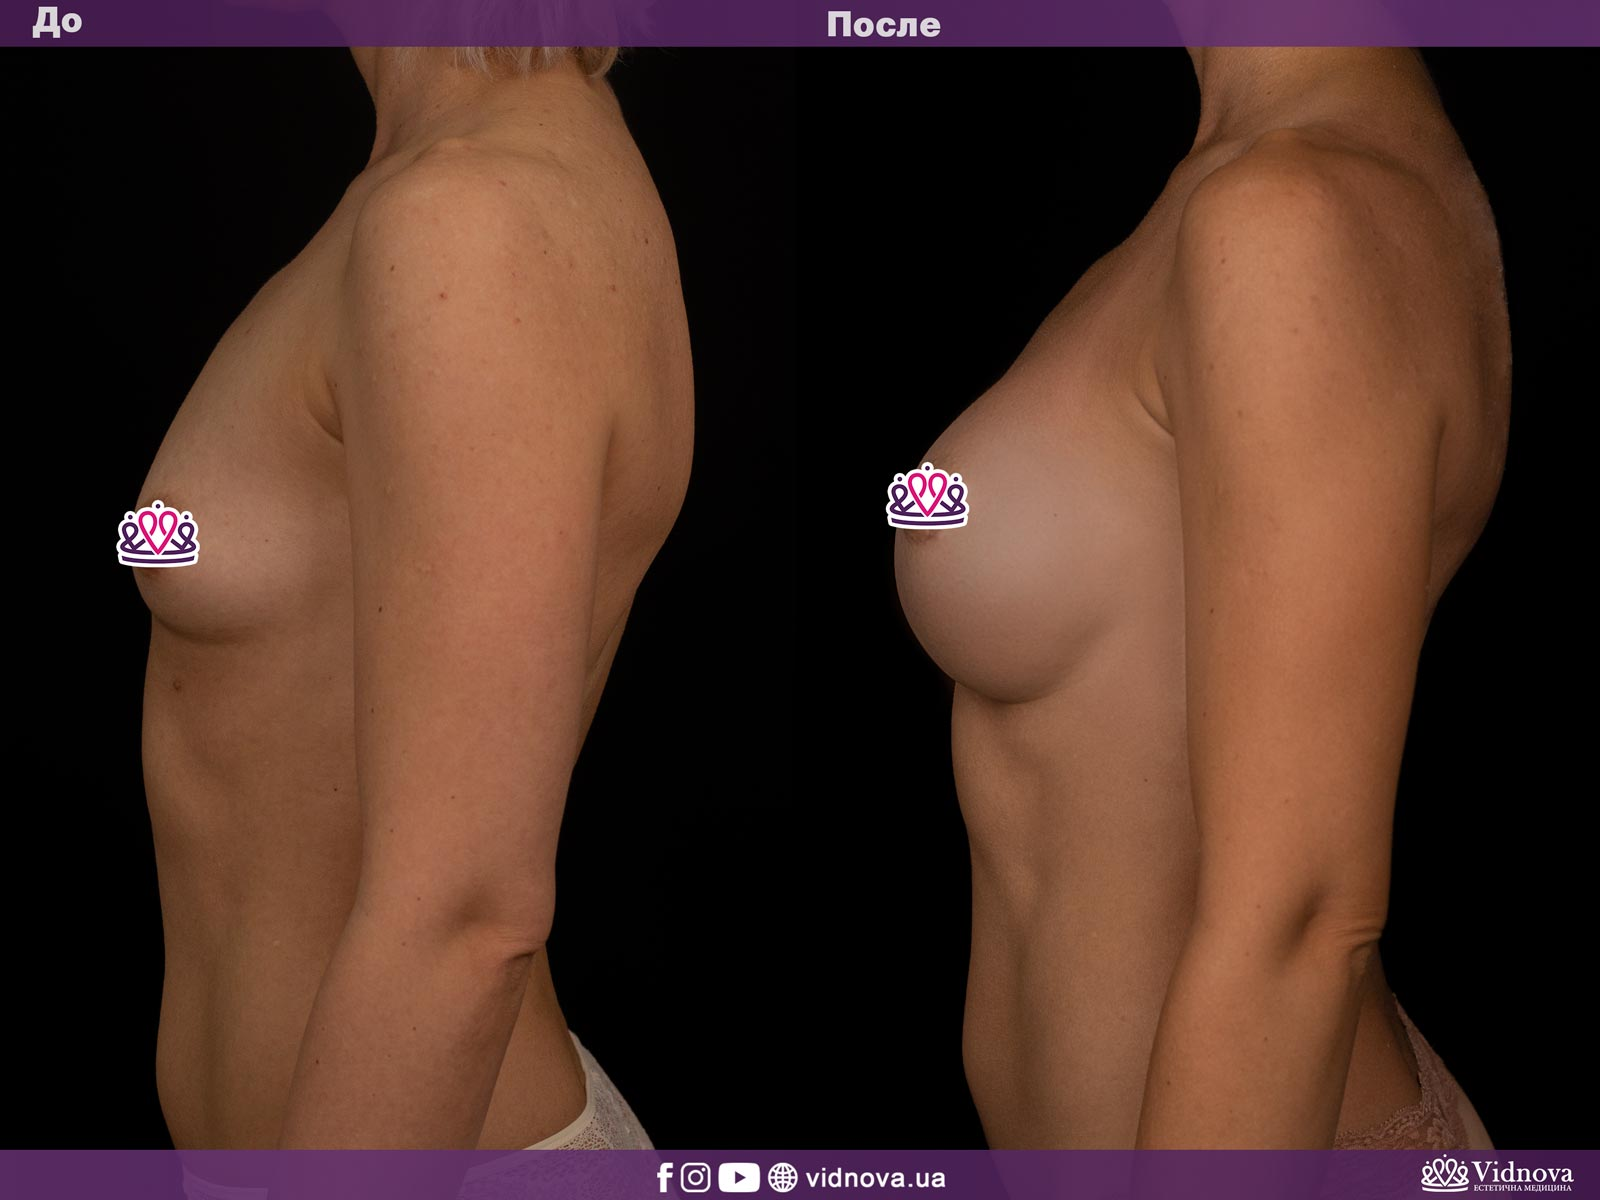 Увеличение груди: Фото ДО и ПОСЛЕ - Пример №8-3 - Клиника Vidnova